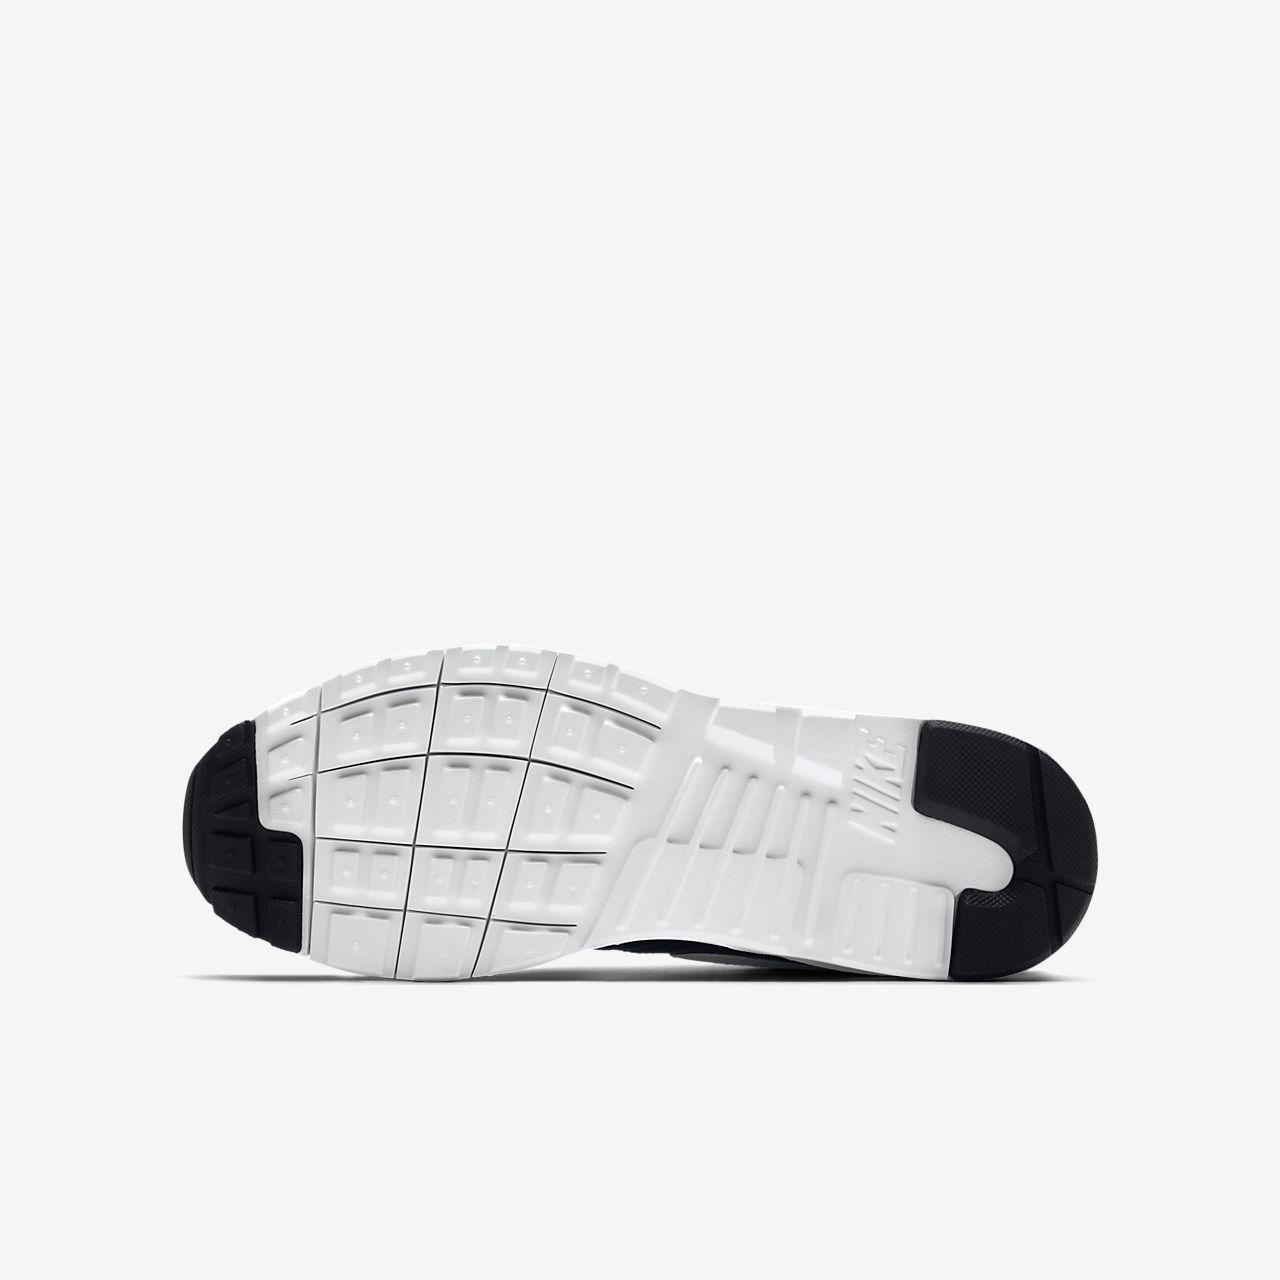 363d4a5986ae68 Nike Air Max Vision Older Kids  Shoe. Nike.com AU